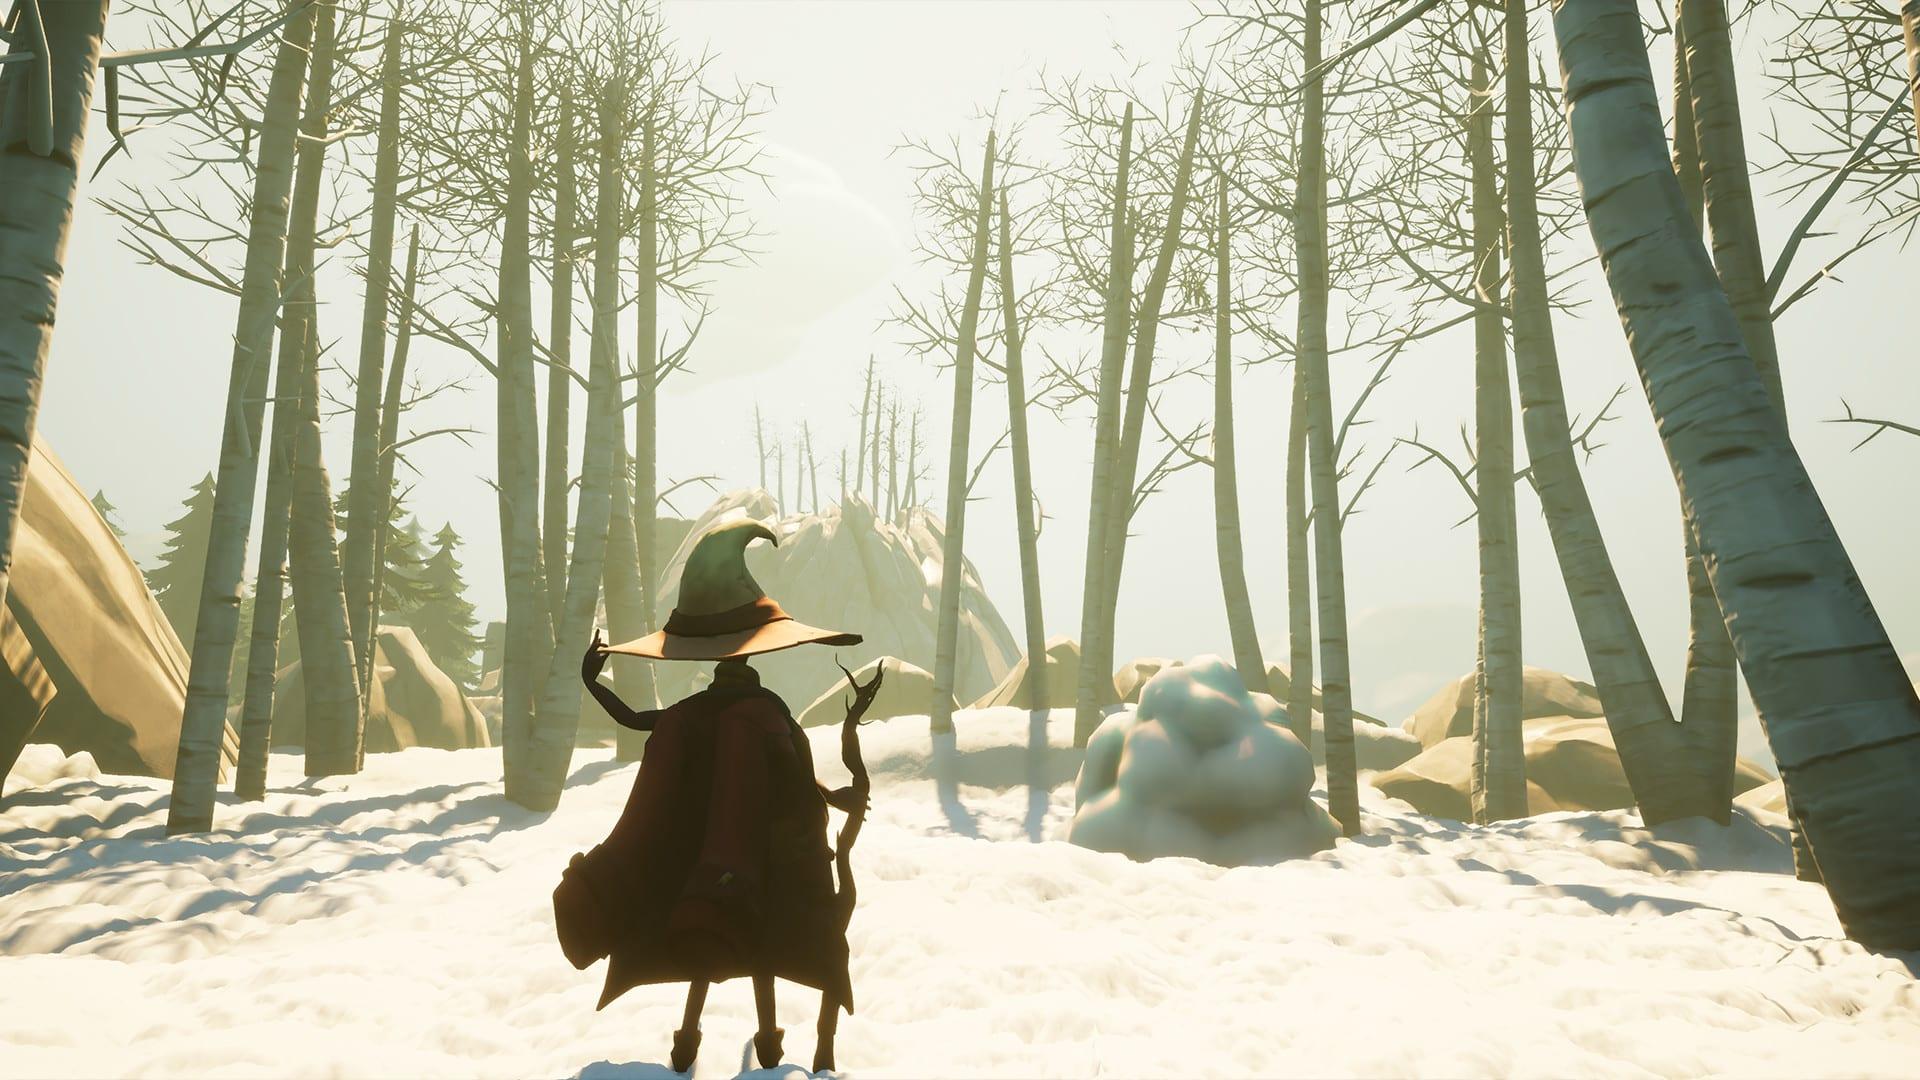 Kinoko ThunderLime serene peaceful exploration game of winter and spring free